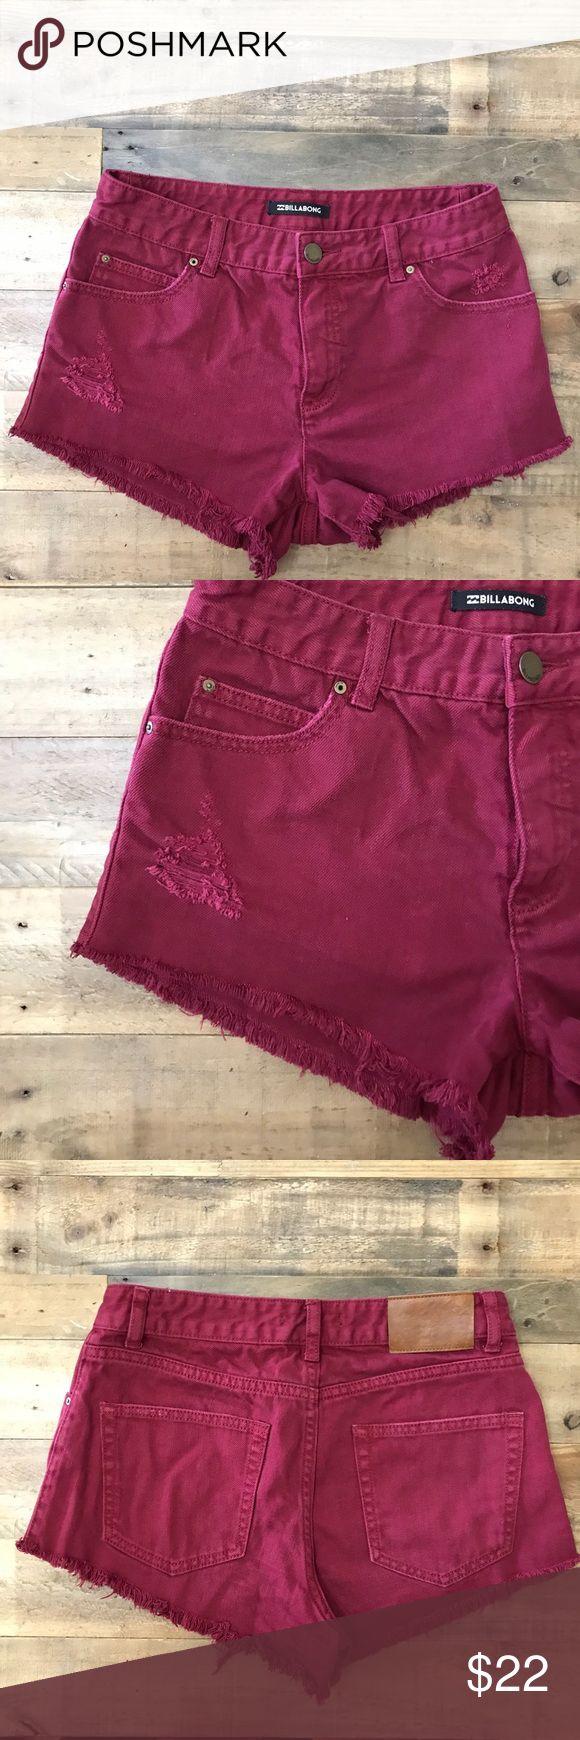 Maroon Shorts Billabong Maroon Shorts. Size 26, fits like a women's 2. Distressed Hem Buckle Shorts Jean Shorts